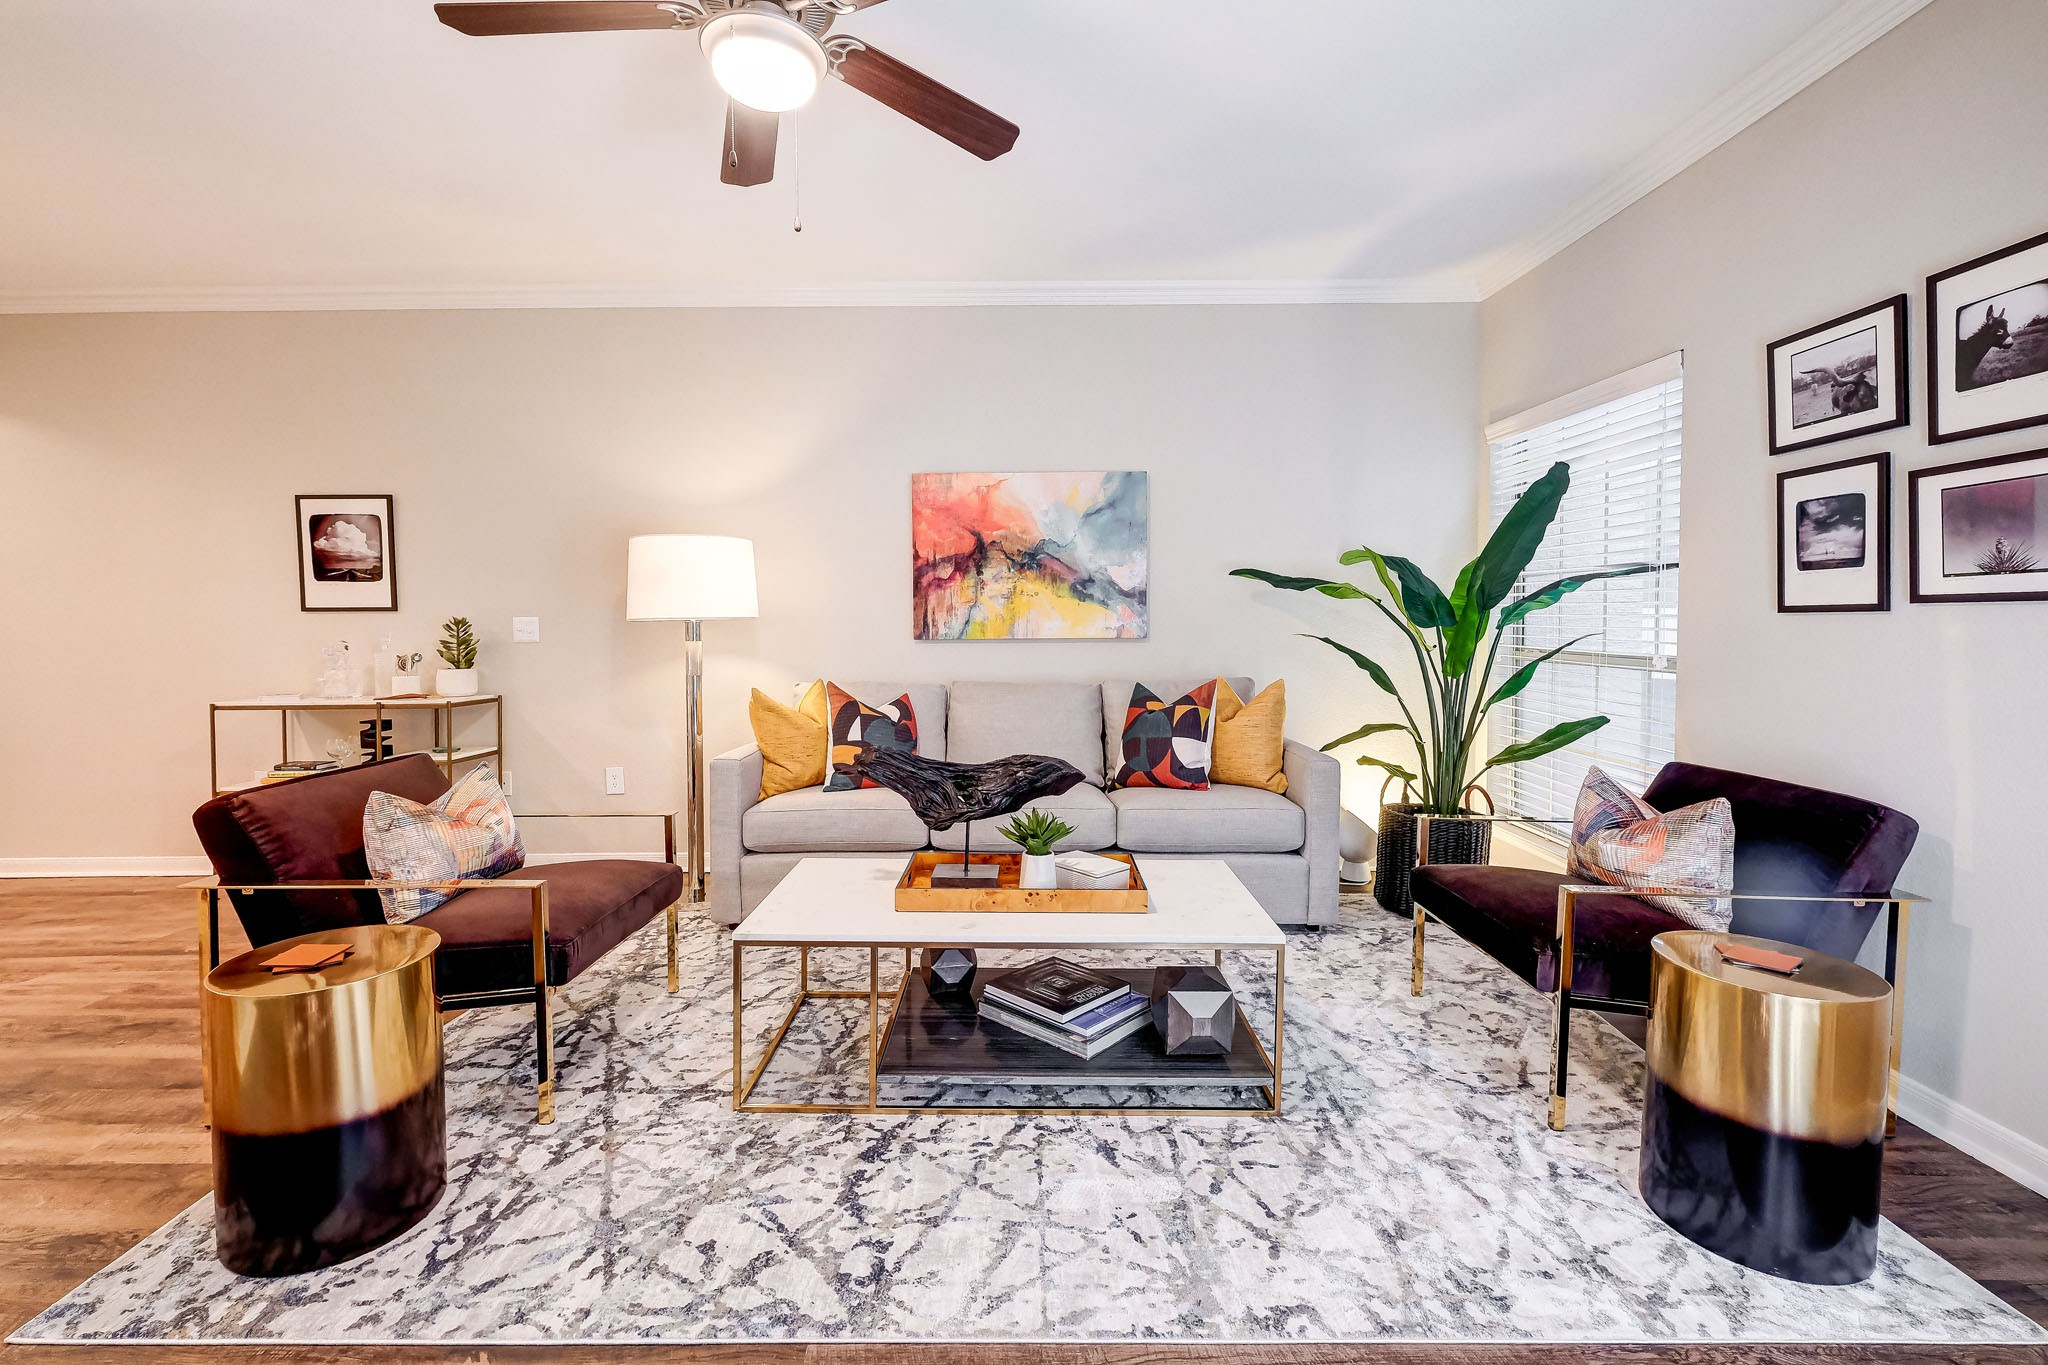 Apartments Near UT Austin Canyon Springs for University of Texas - Austin Students in Austin, TX